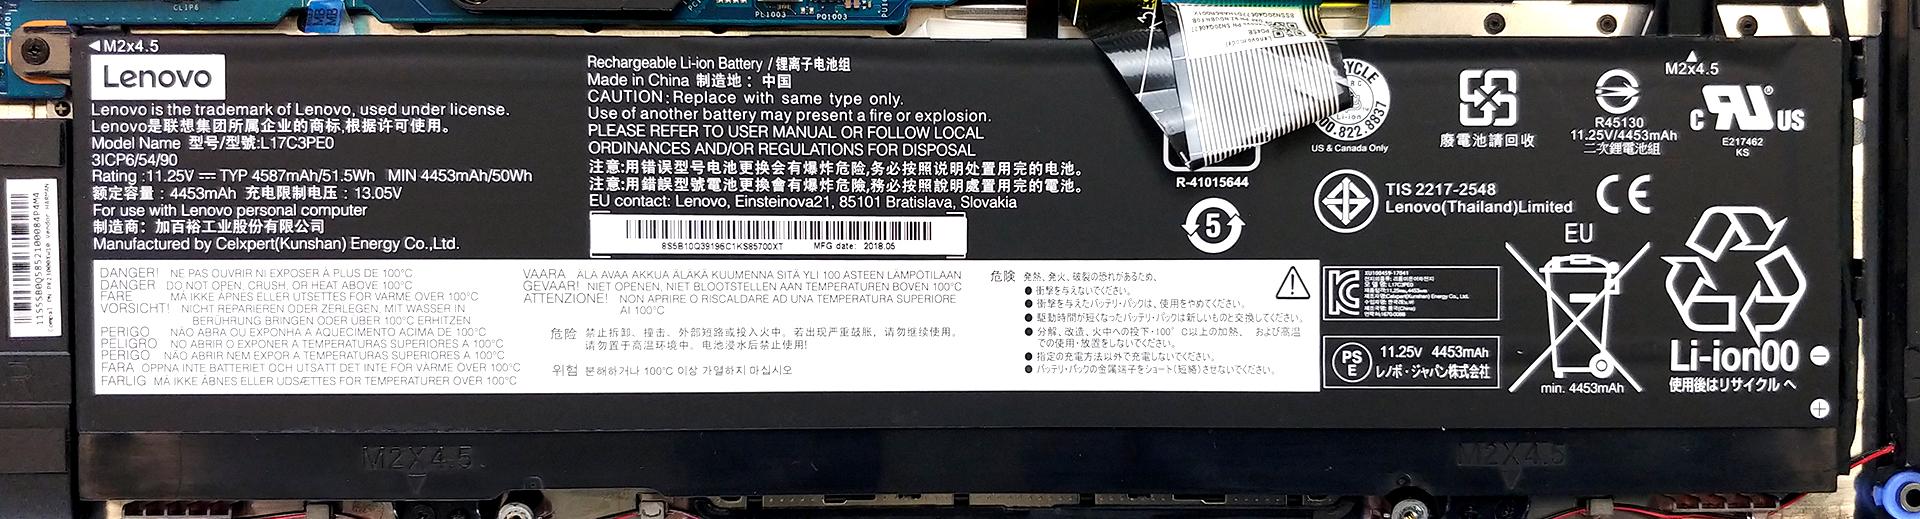 Lenovo Yoga 730 (15″) review – born to make the artists happy